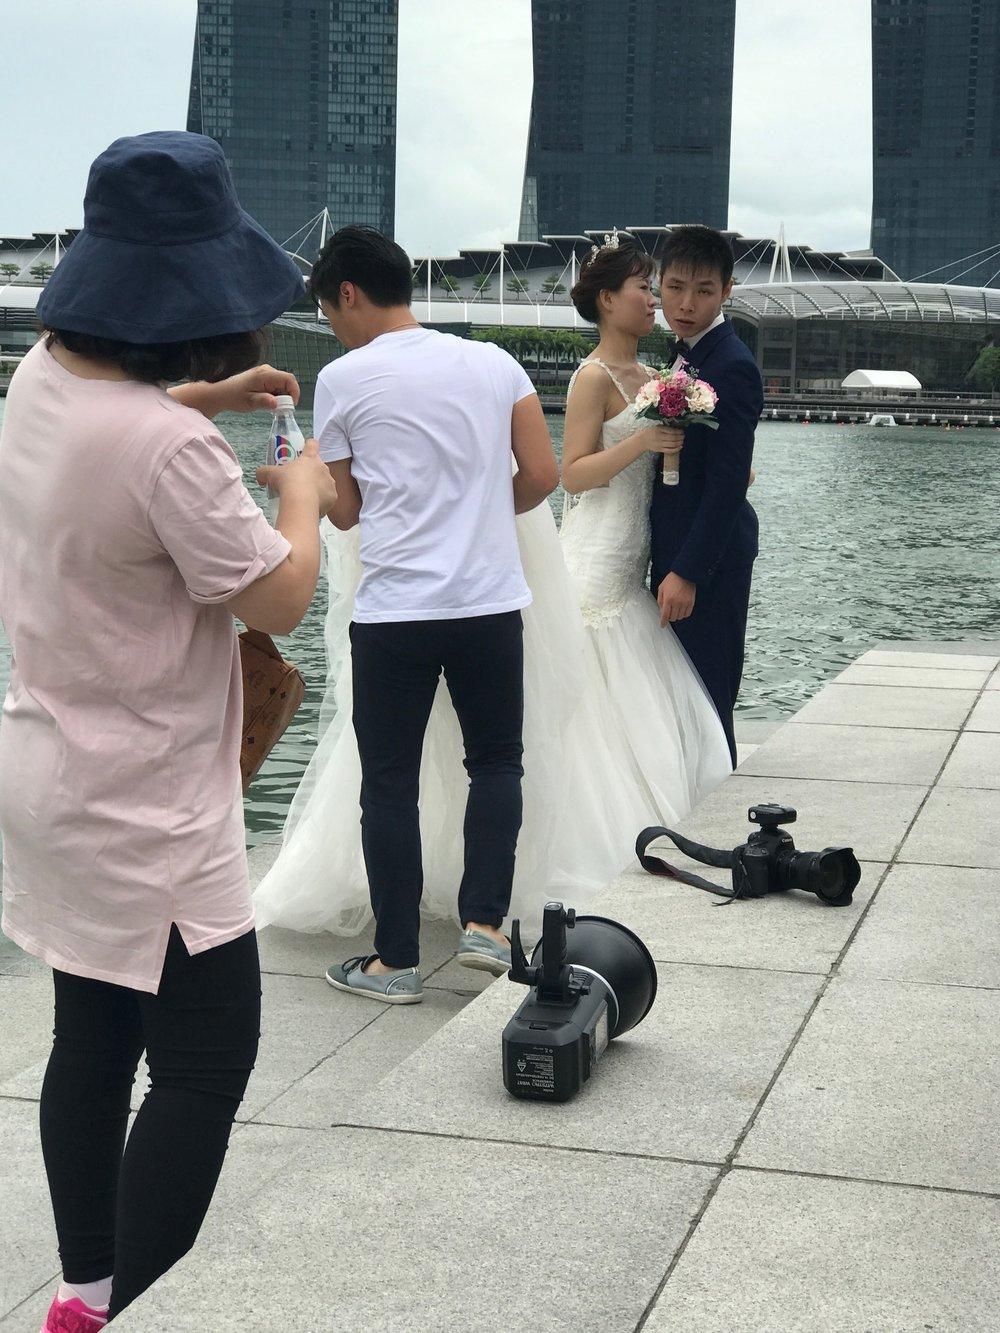 Wedding photos are always fun to watch.